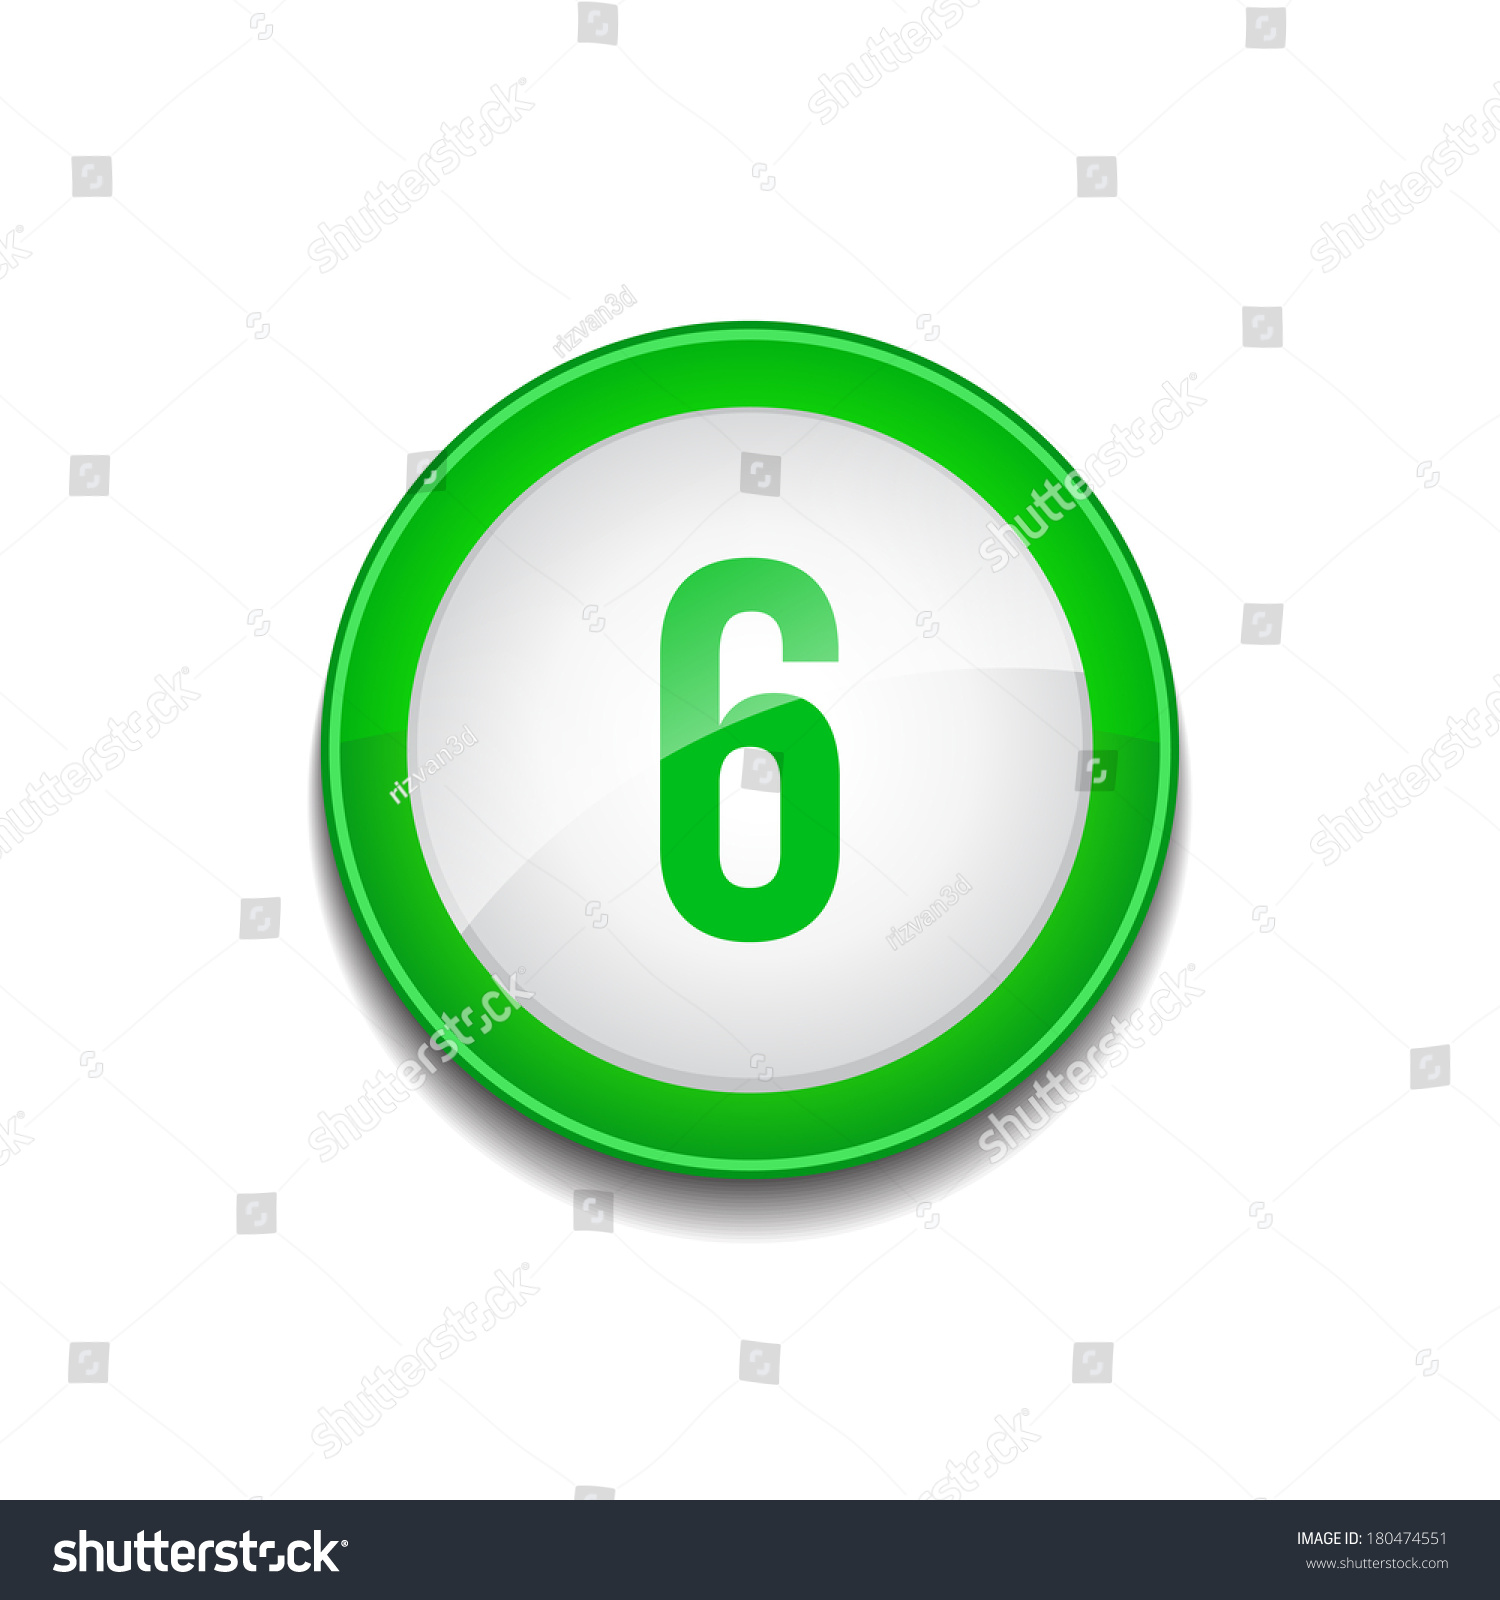 Number Sign Vector Wiring Diagrams Diagramofseriescircuitforkidsjpg 6 Circular Green Stock 180474551 House Shapes